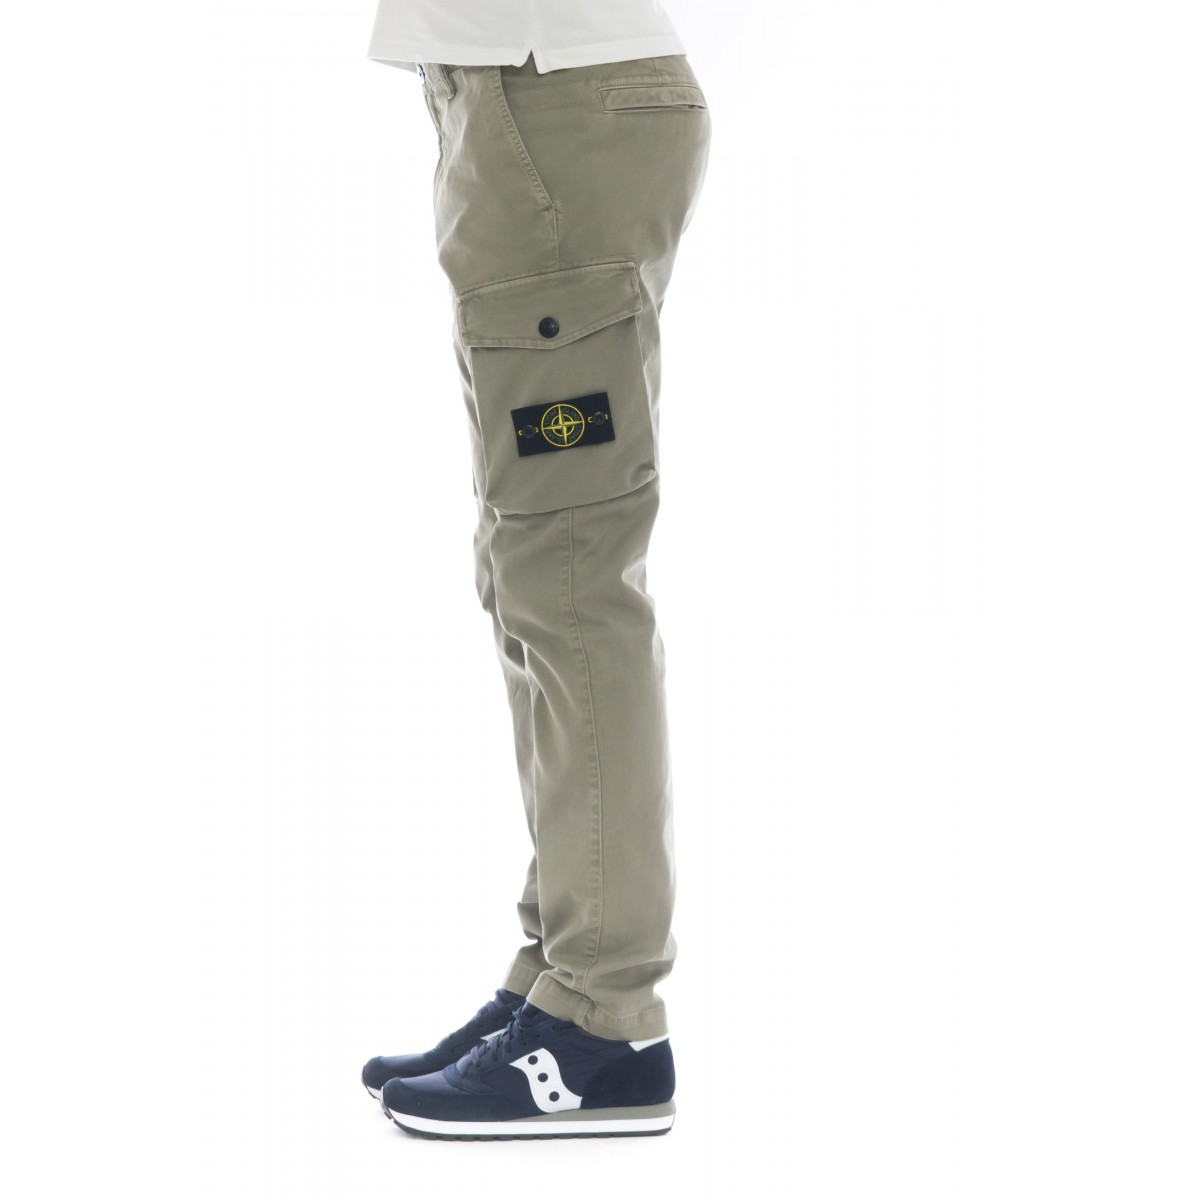 Cargo Trousers - 308LI Broken Twill stretch cotton